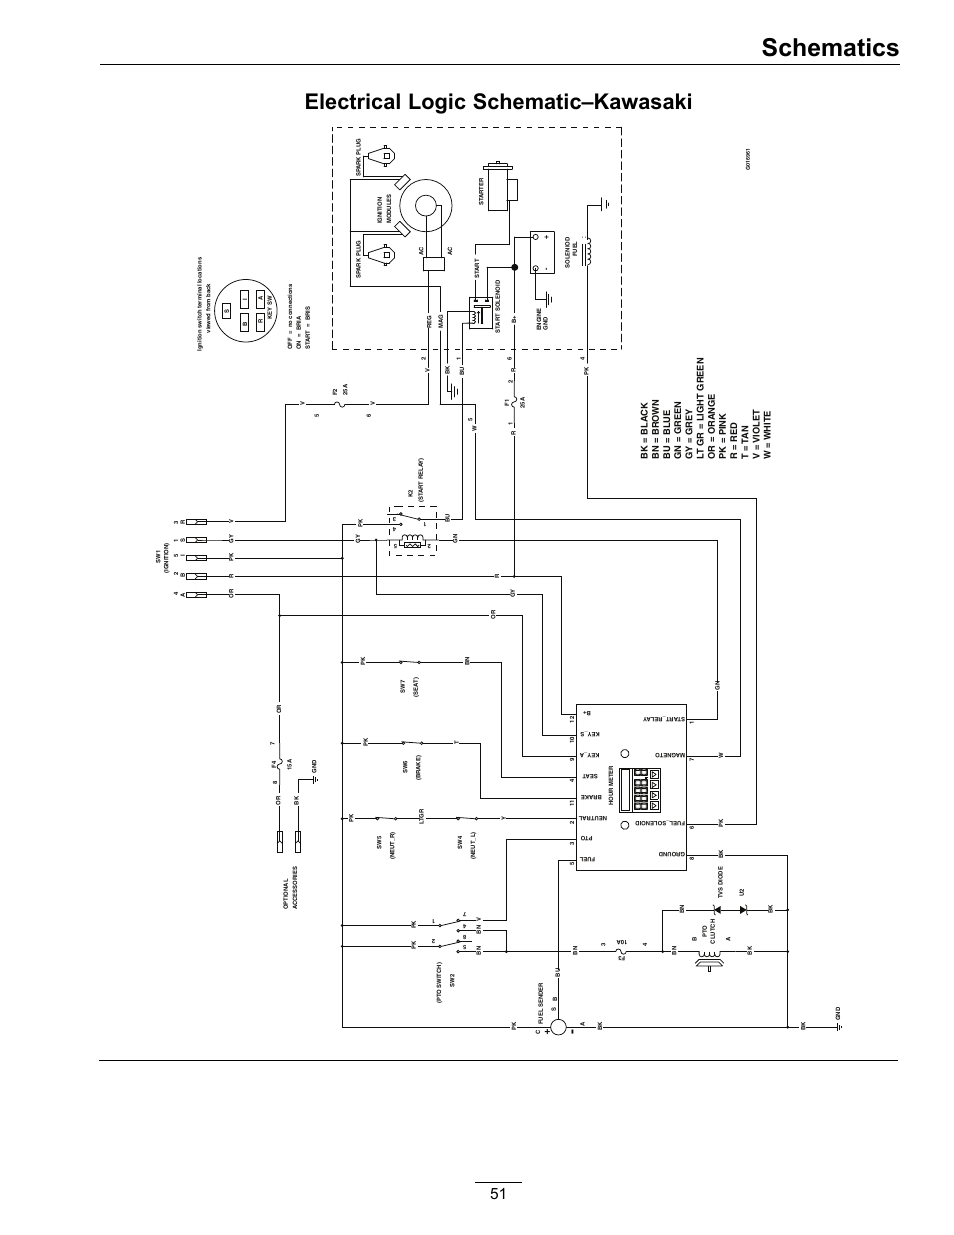 Exmark Wiring Schematic | Repair Manual